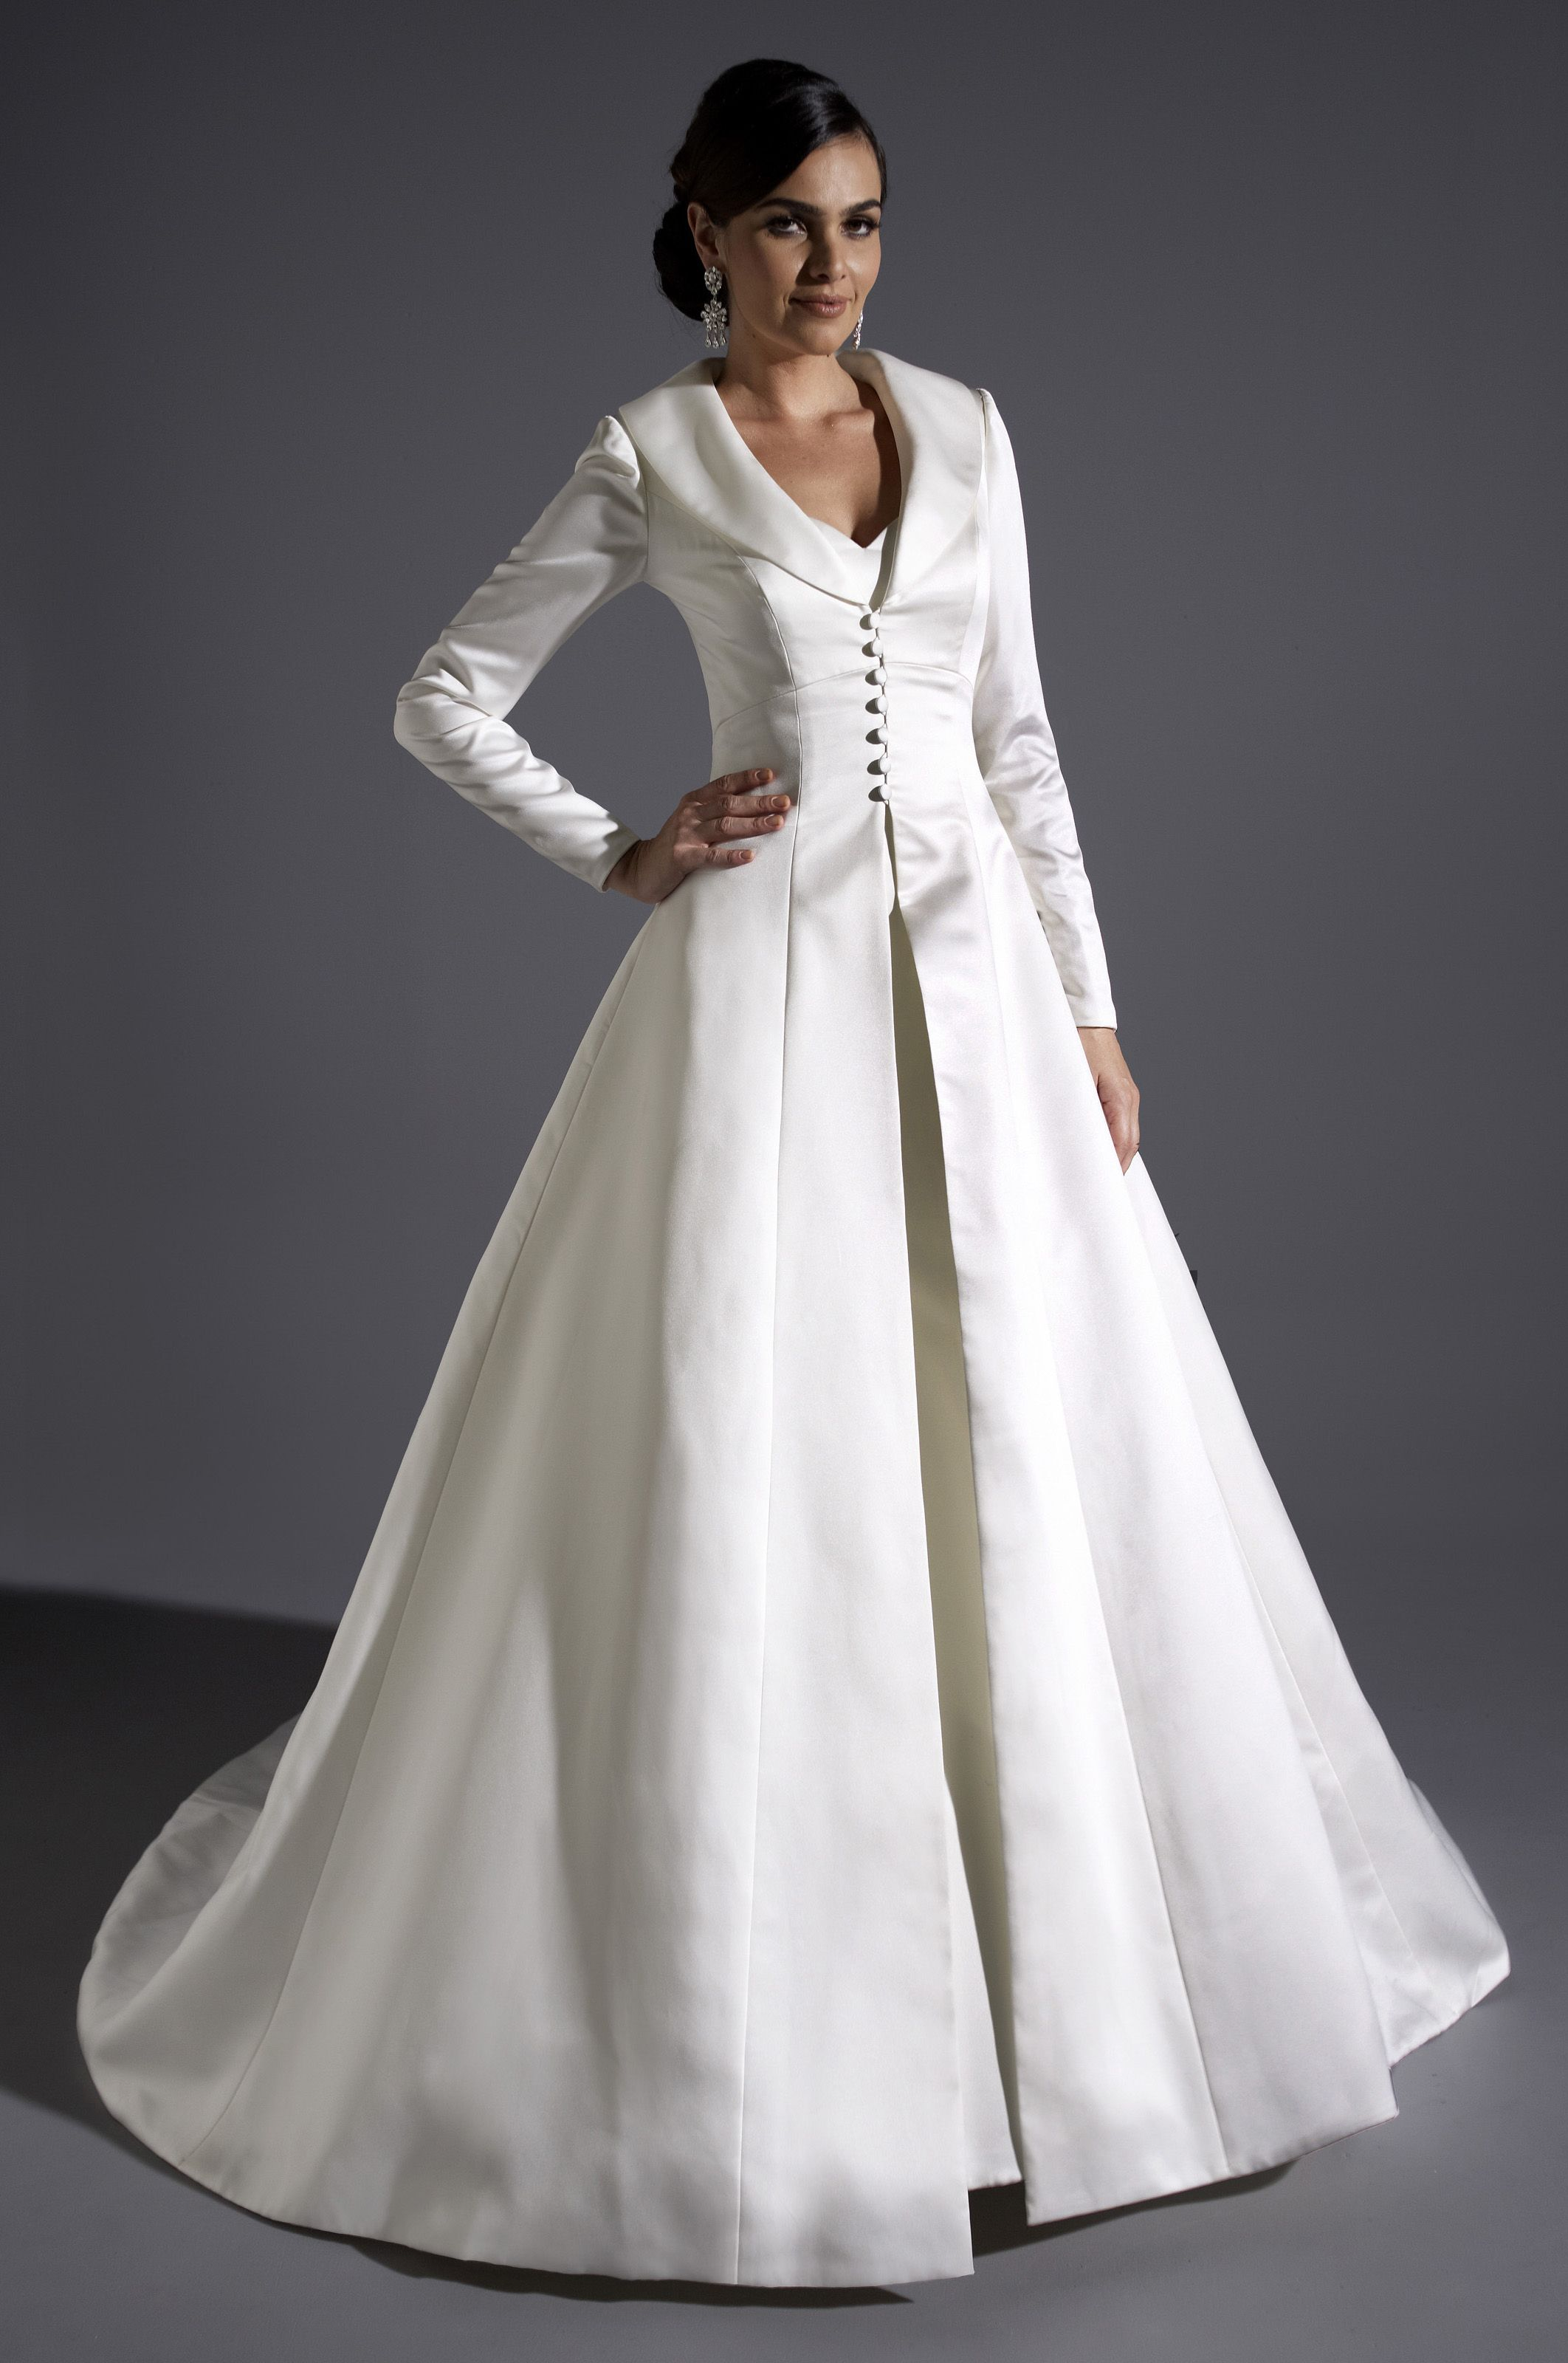 eternity bridal | Wedding dresses | Pinterest | Wedding dress ...